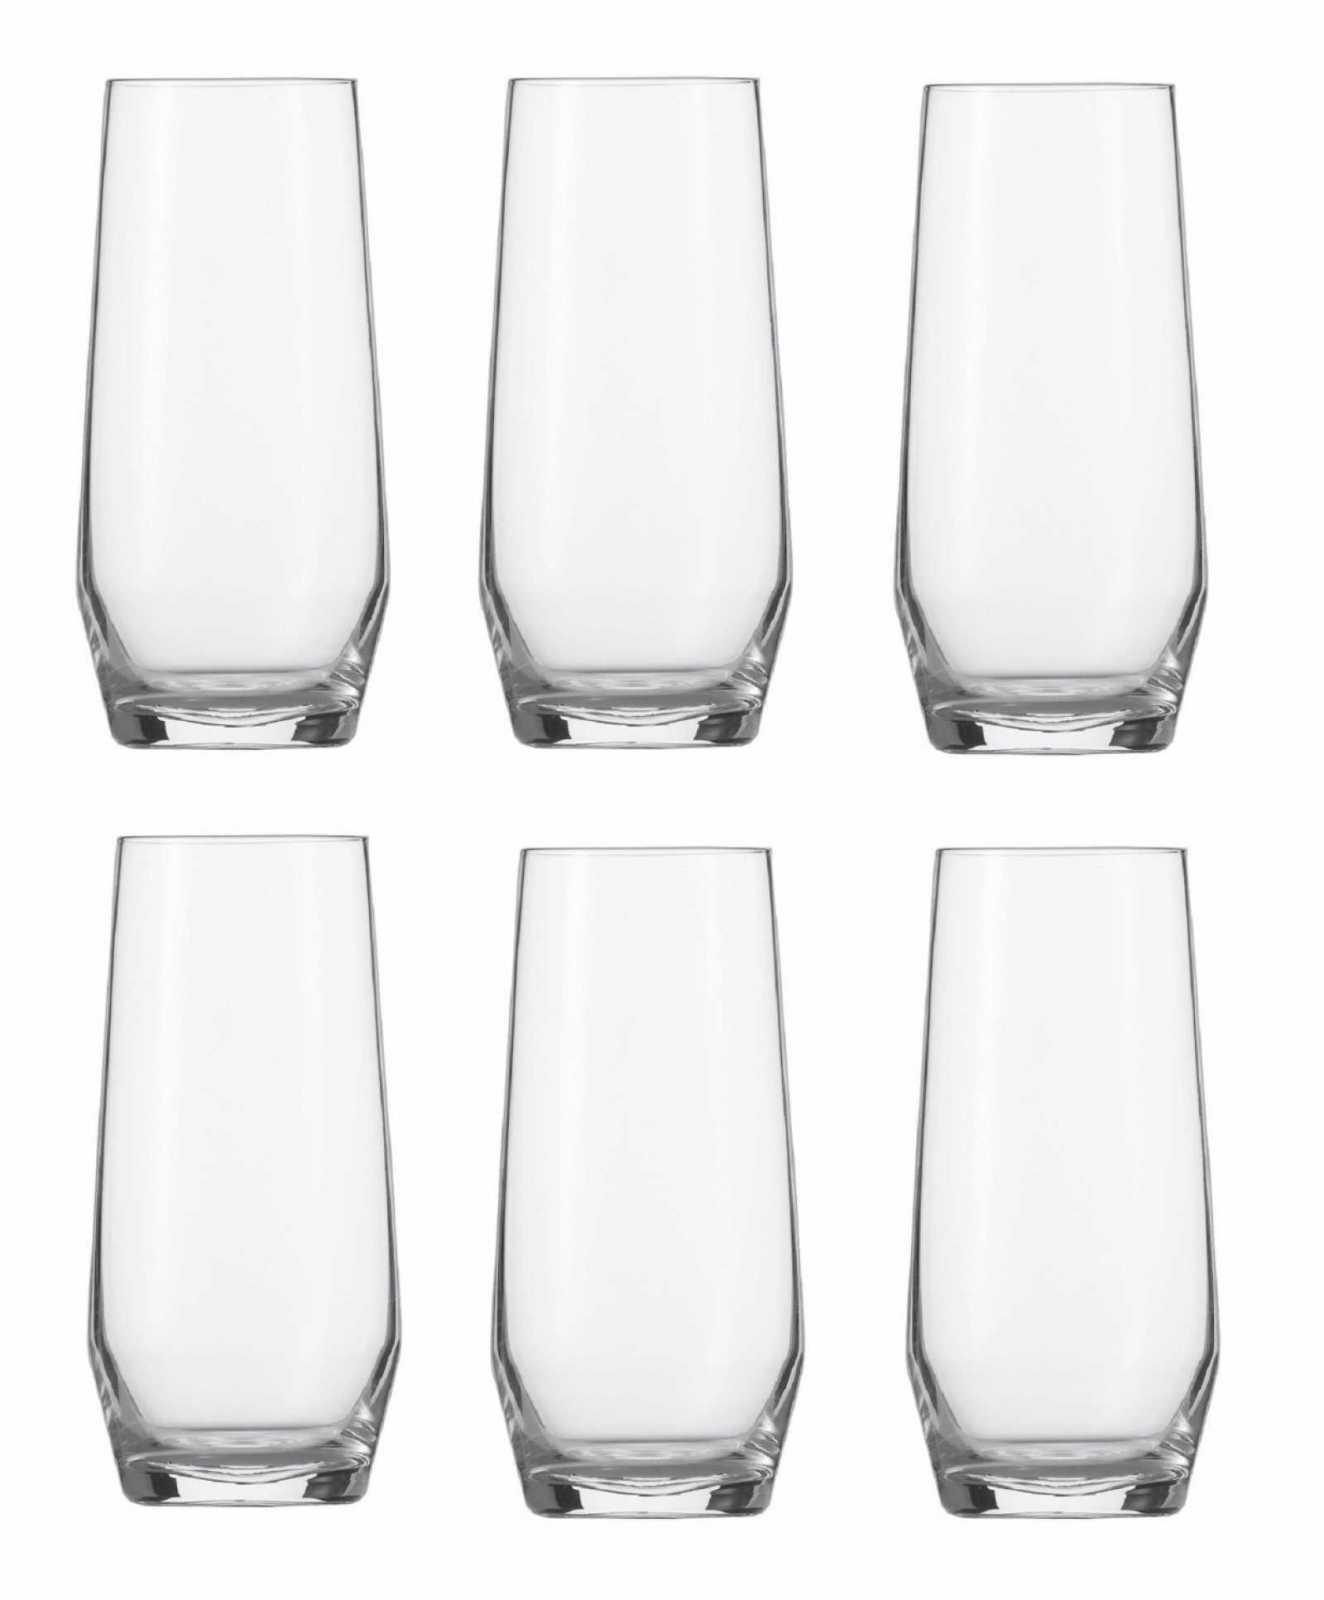 Онлайн каталог PROMENU: Набор стаканов Schott Zwiesel PURE, объем 0,357 л, прозрачный, 6 штук Schott Zwiesel 113771_6шт